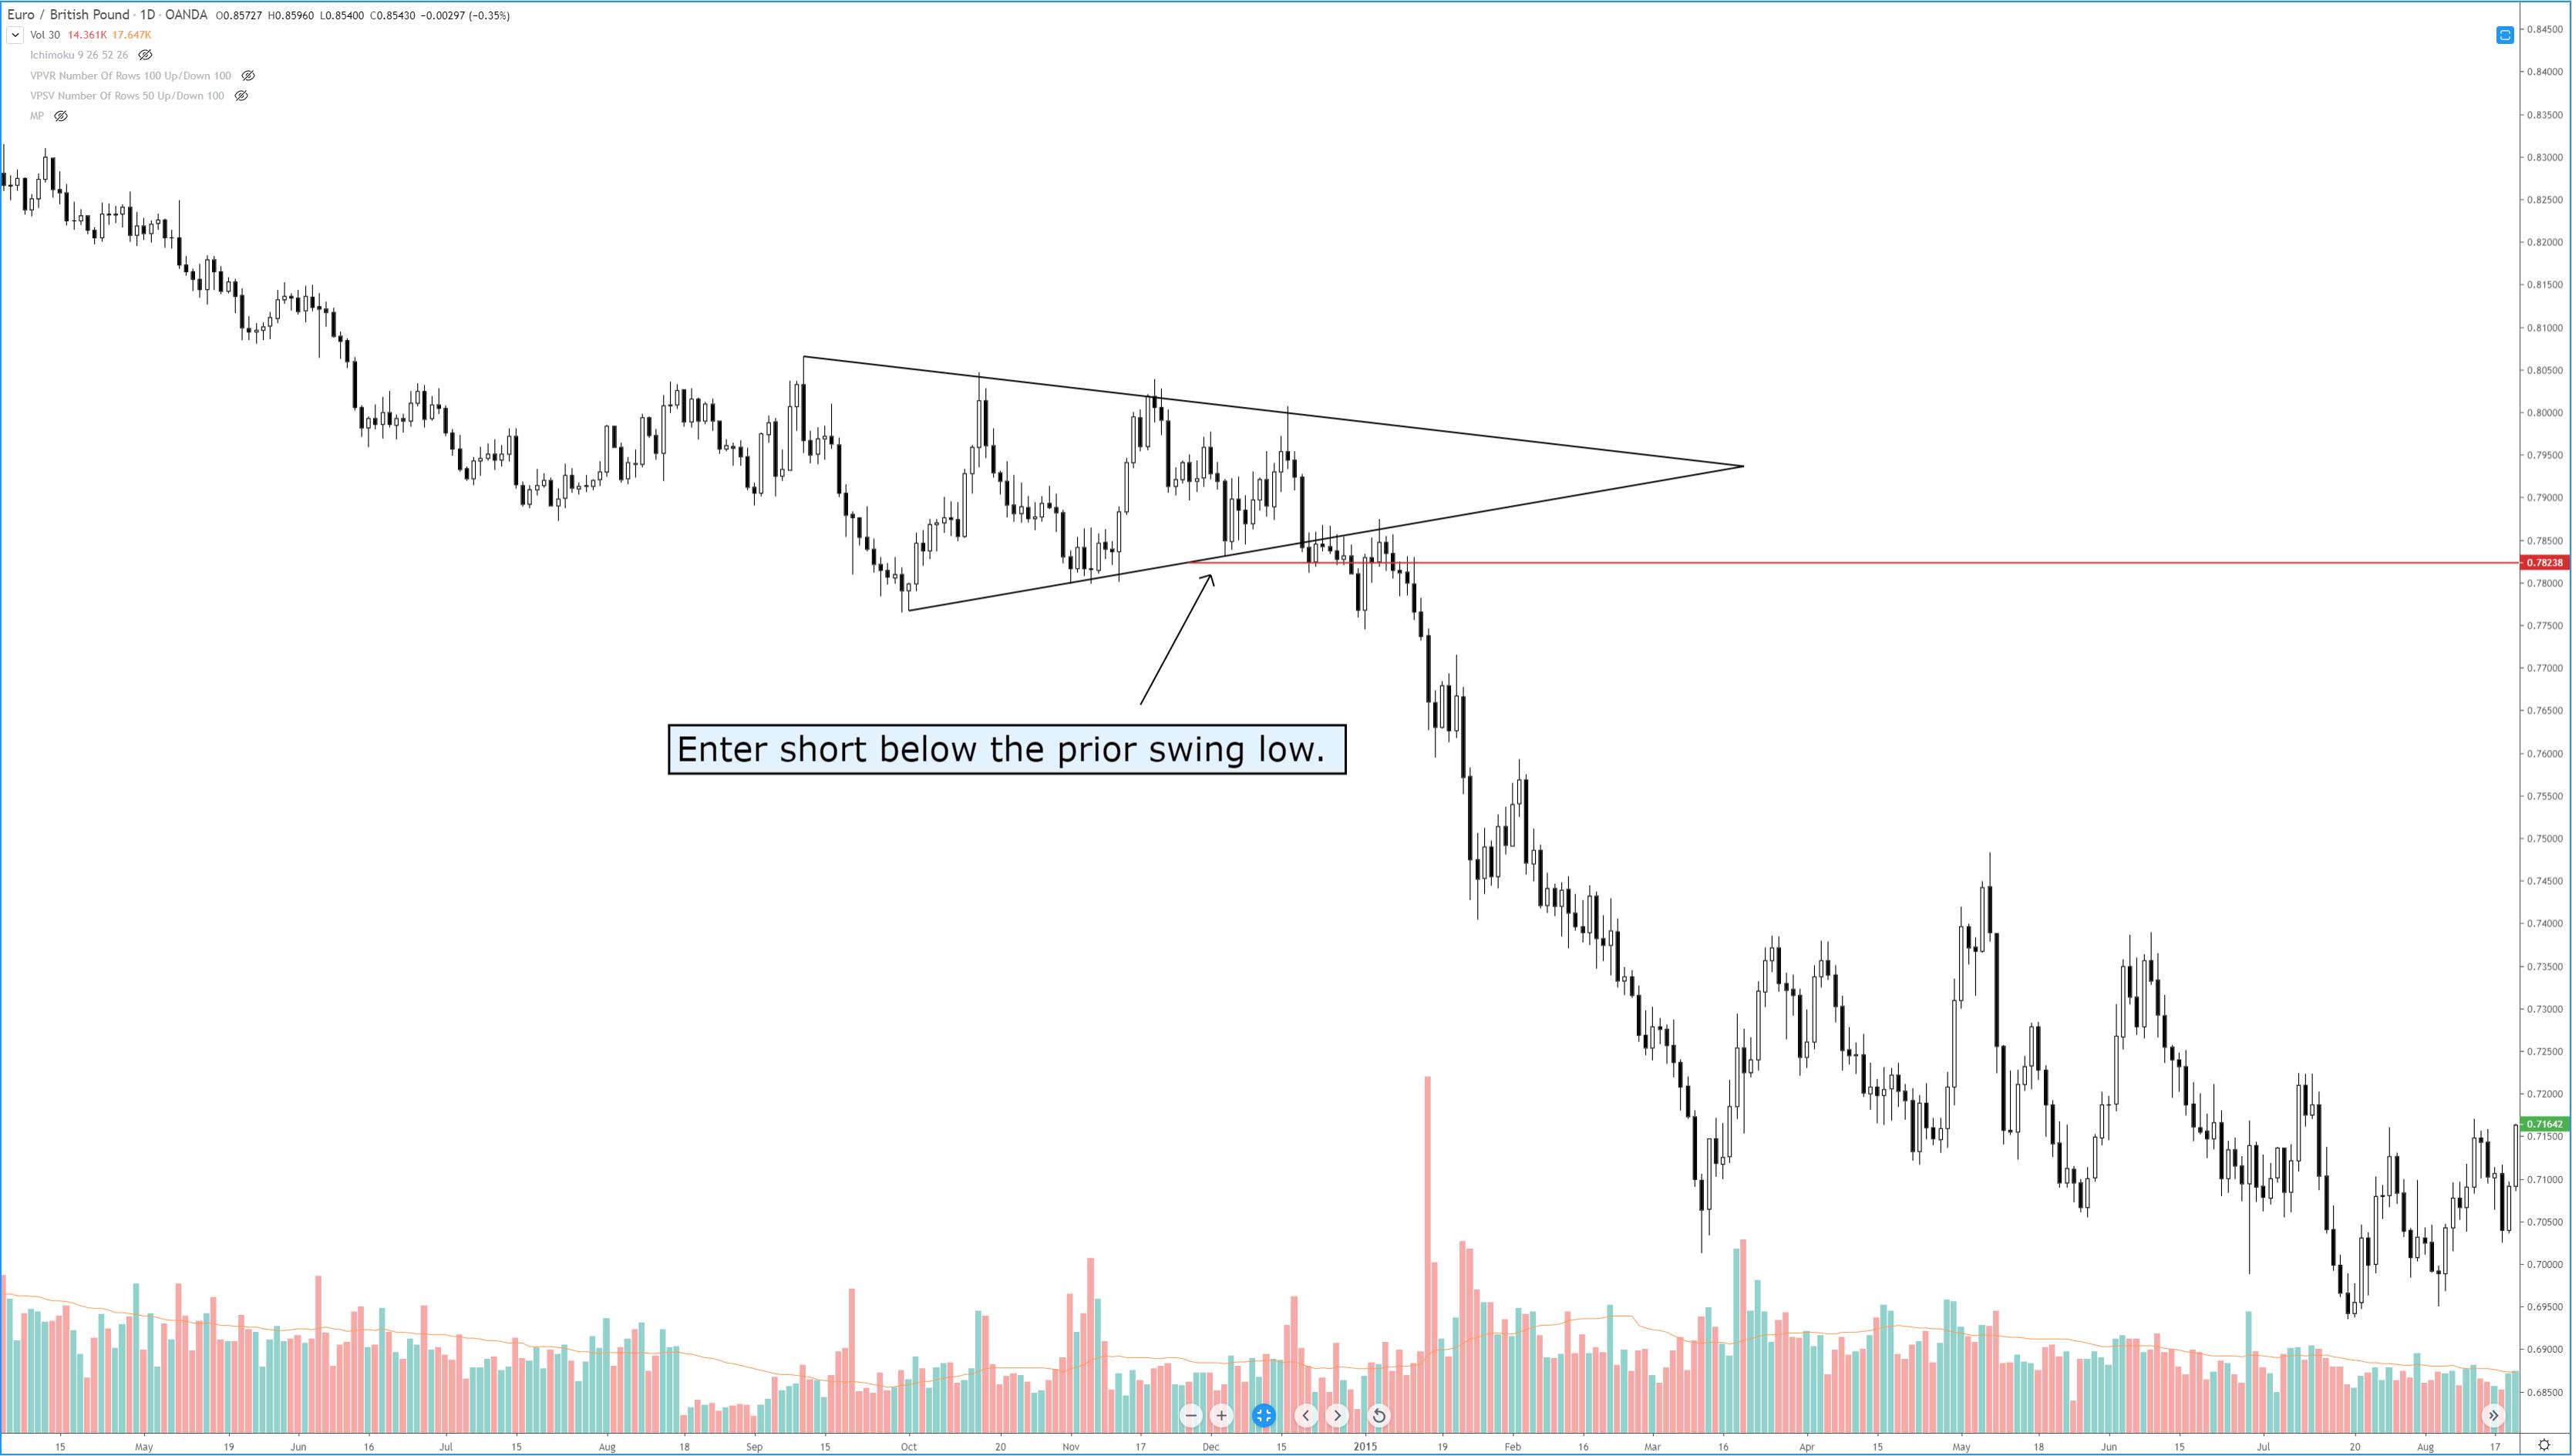 Symmetrical Triangle - Short Entry